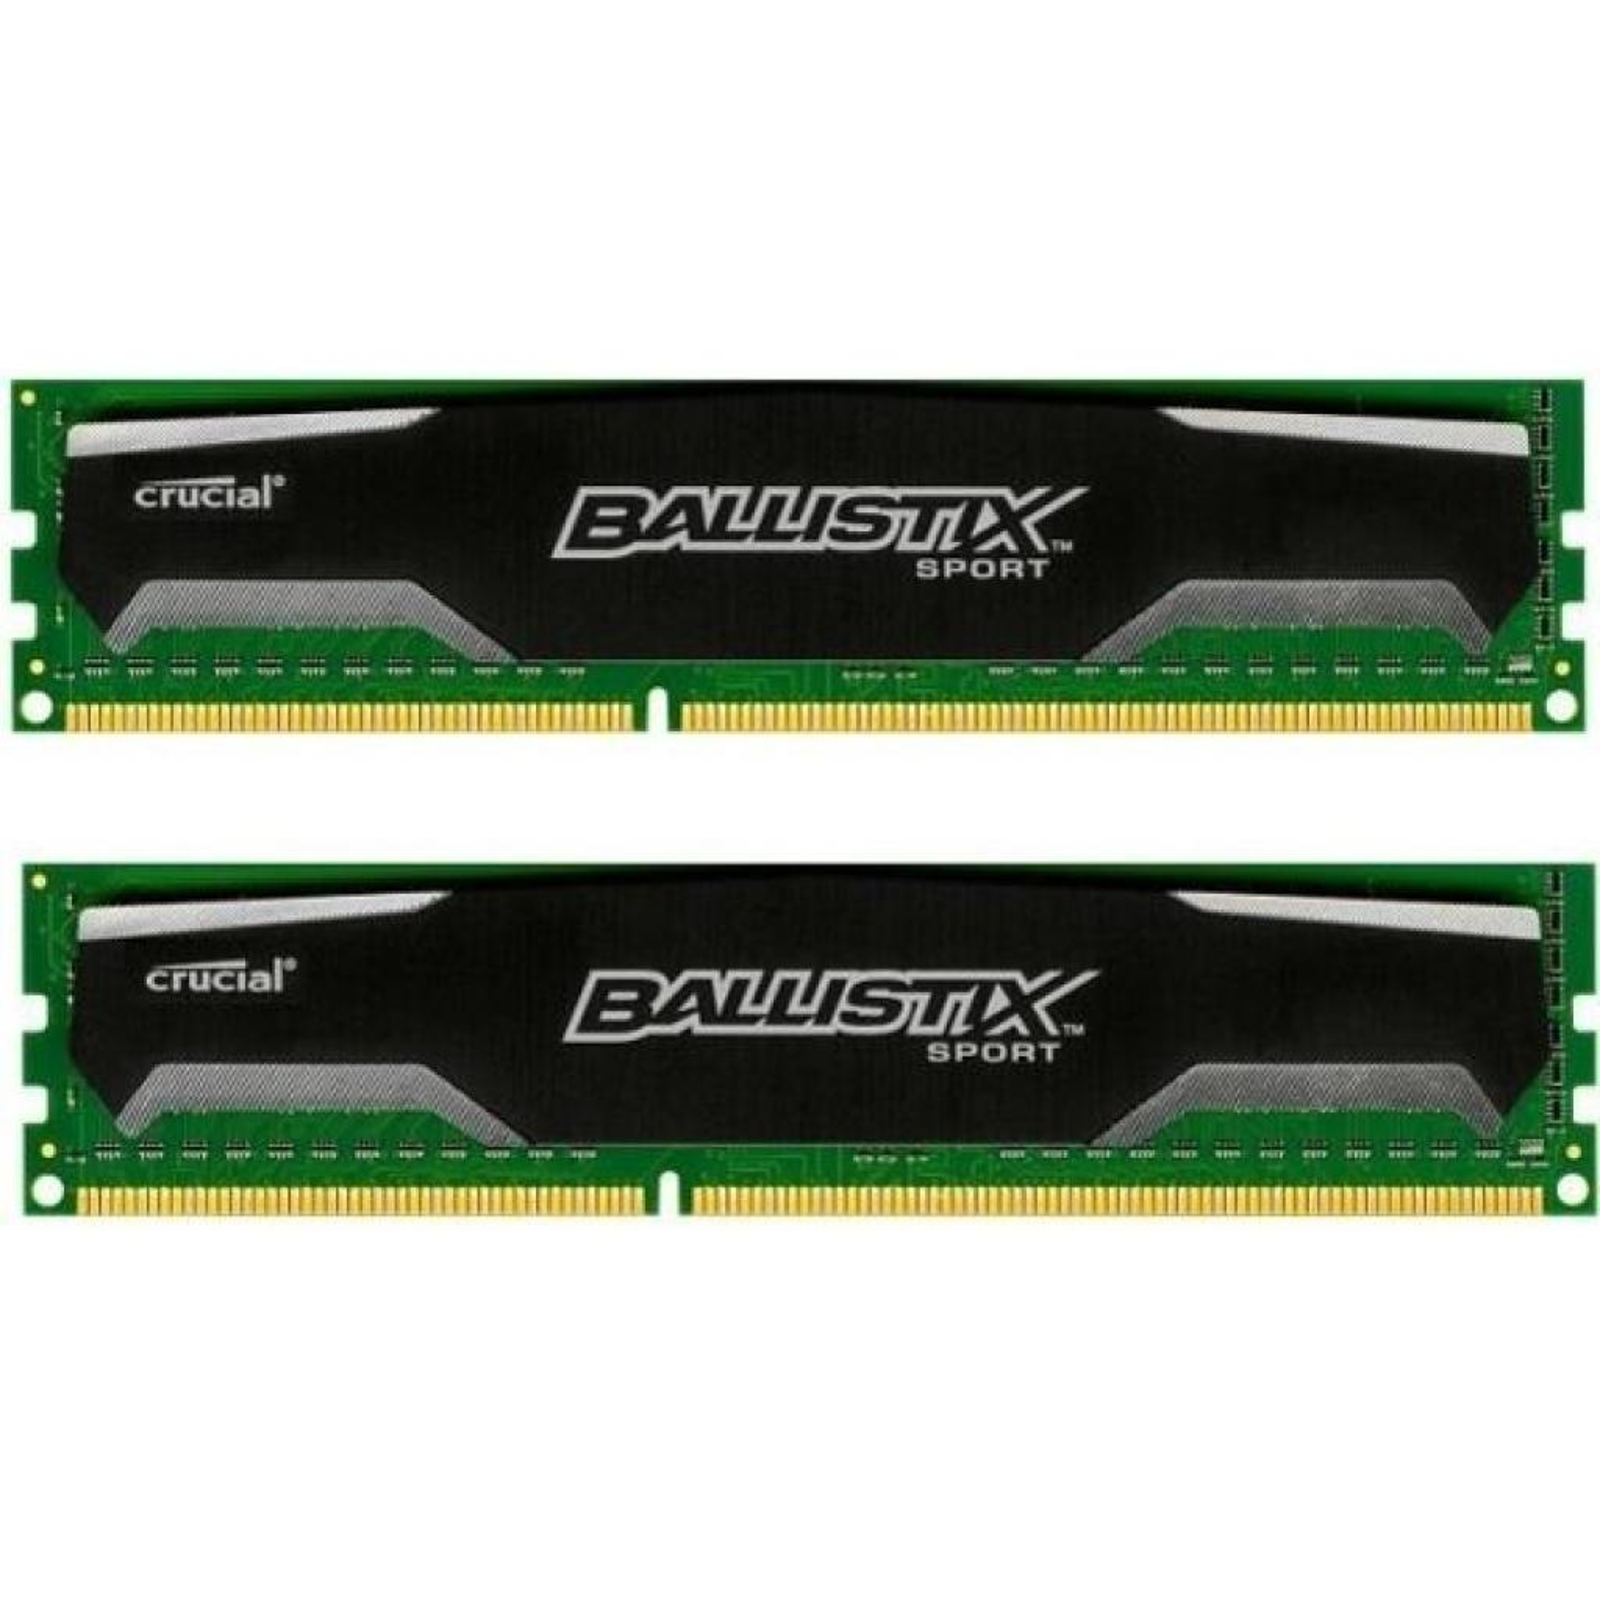 Модуль памяти для компьютера DDR3 8GB (2x4GB) 1600 MHz Ballistix Sport MICRON (BLS2C4G3D169DS1J)